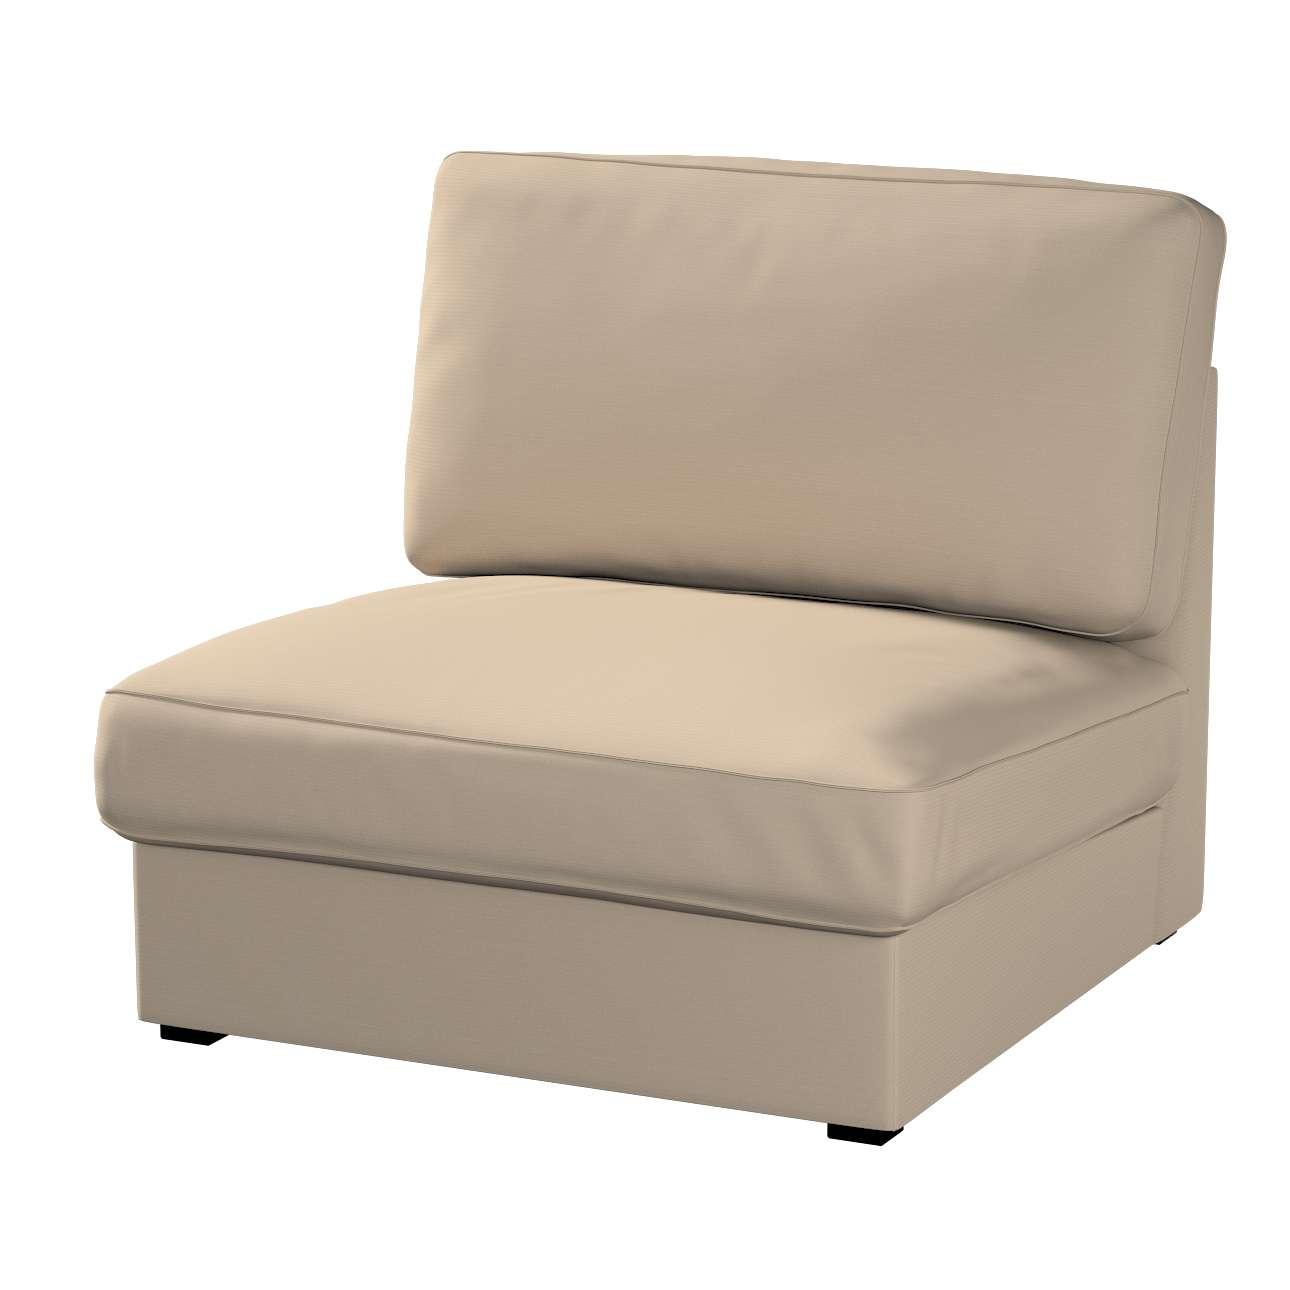 Pokrowiec na fotel Kivik Fotel Kivik w kolekcji Cotton Panama, tkanina: 702-28